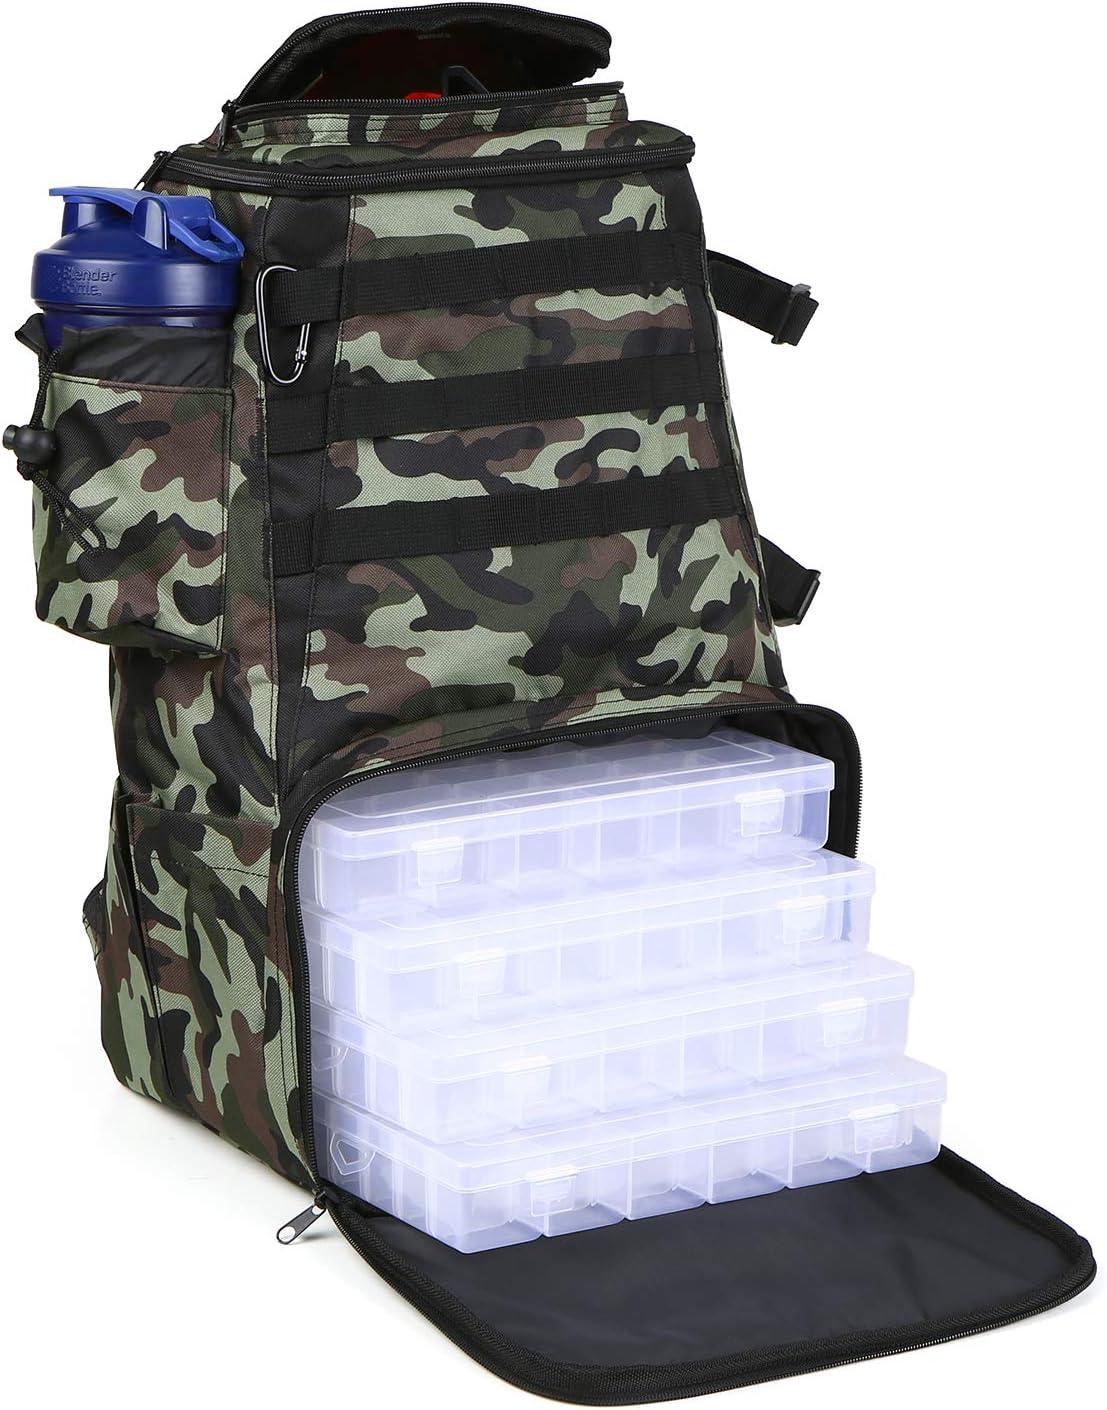 Lixada Fishing 70% OFF Outlet Tackle Multifunctional Ut Backpack Max 73% OFF